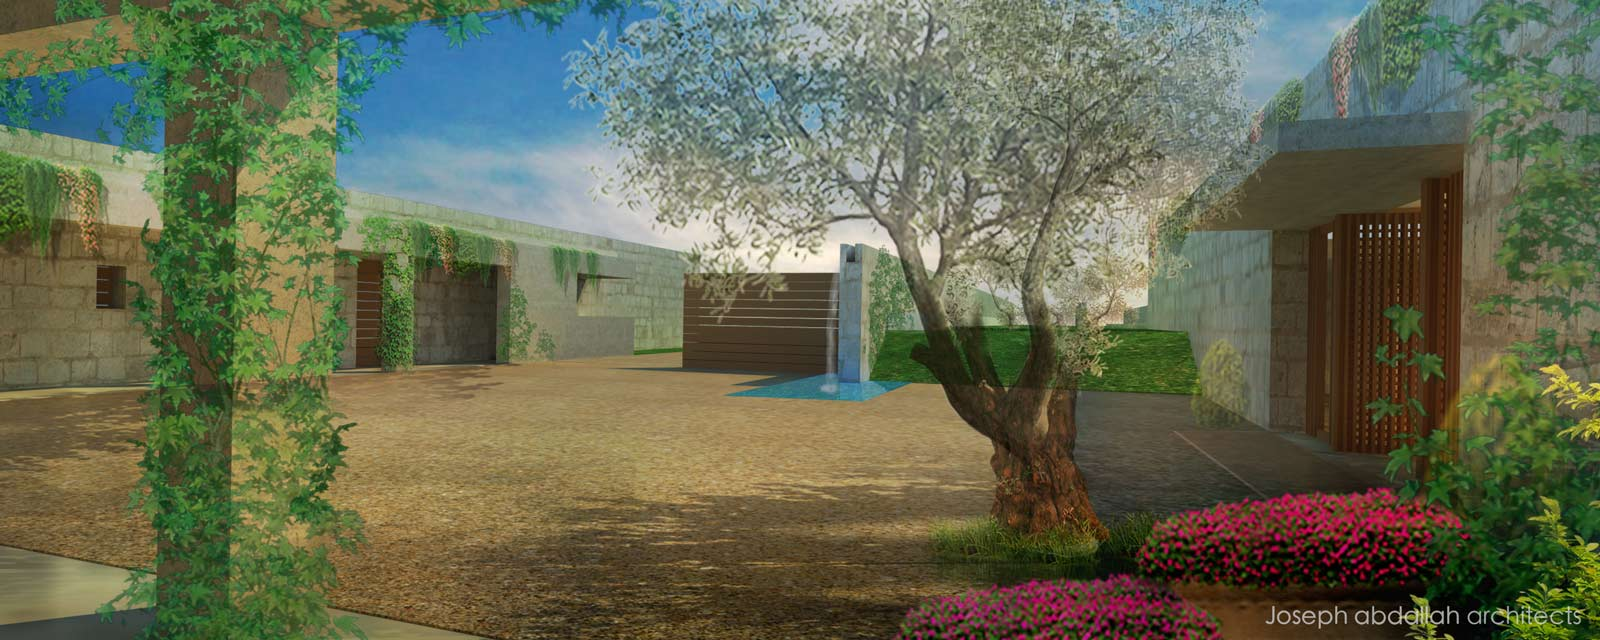 frangieh-sleiman-basel-villa-architecture-landscape-bnache-lebanon-joseph-abdallah-architects-1